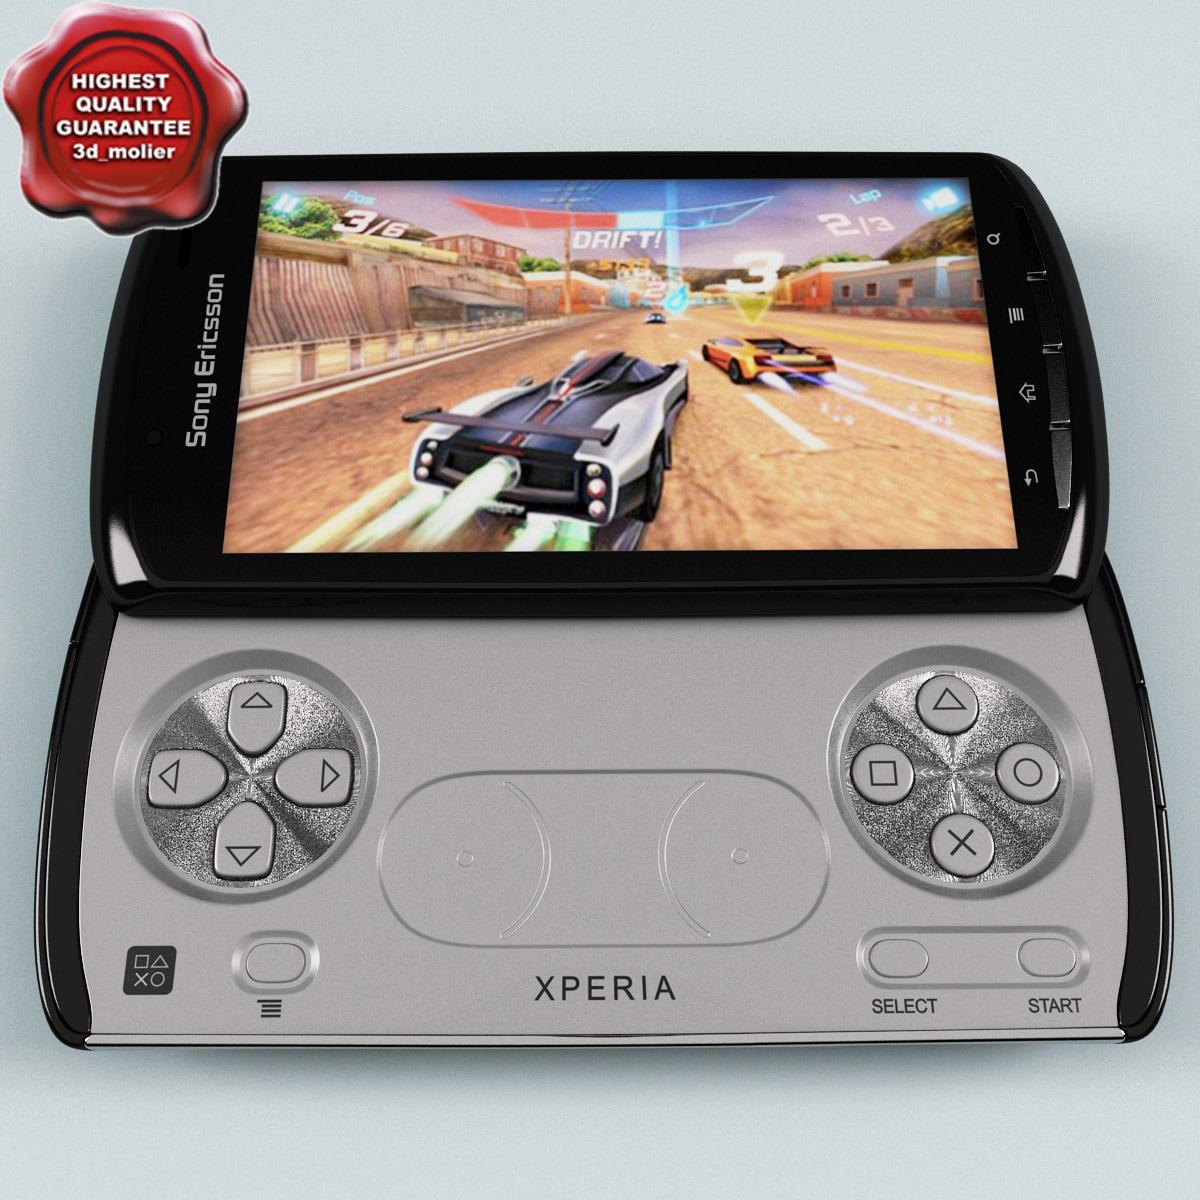 Sony_Ericsson_Xperia_Play_00.jpg